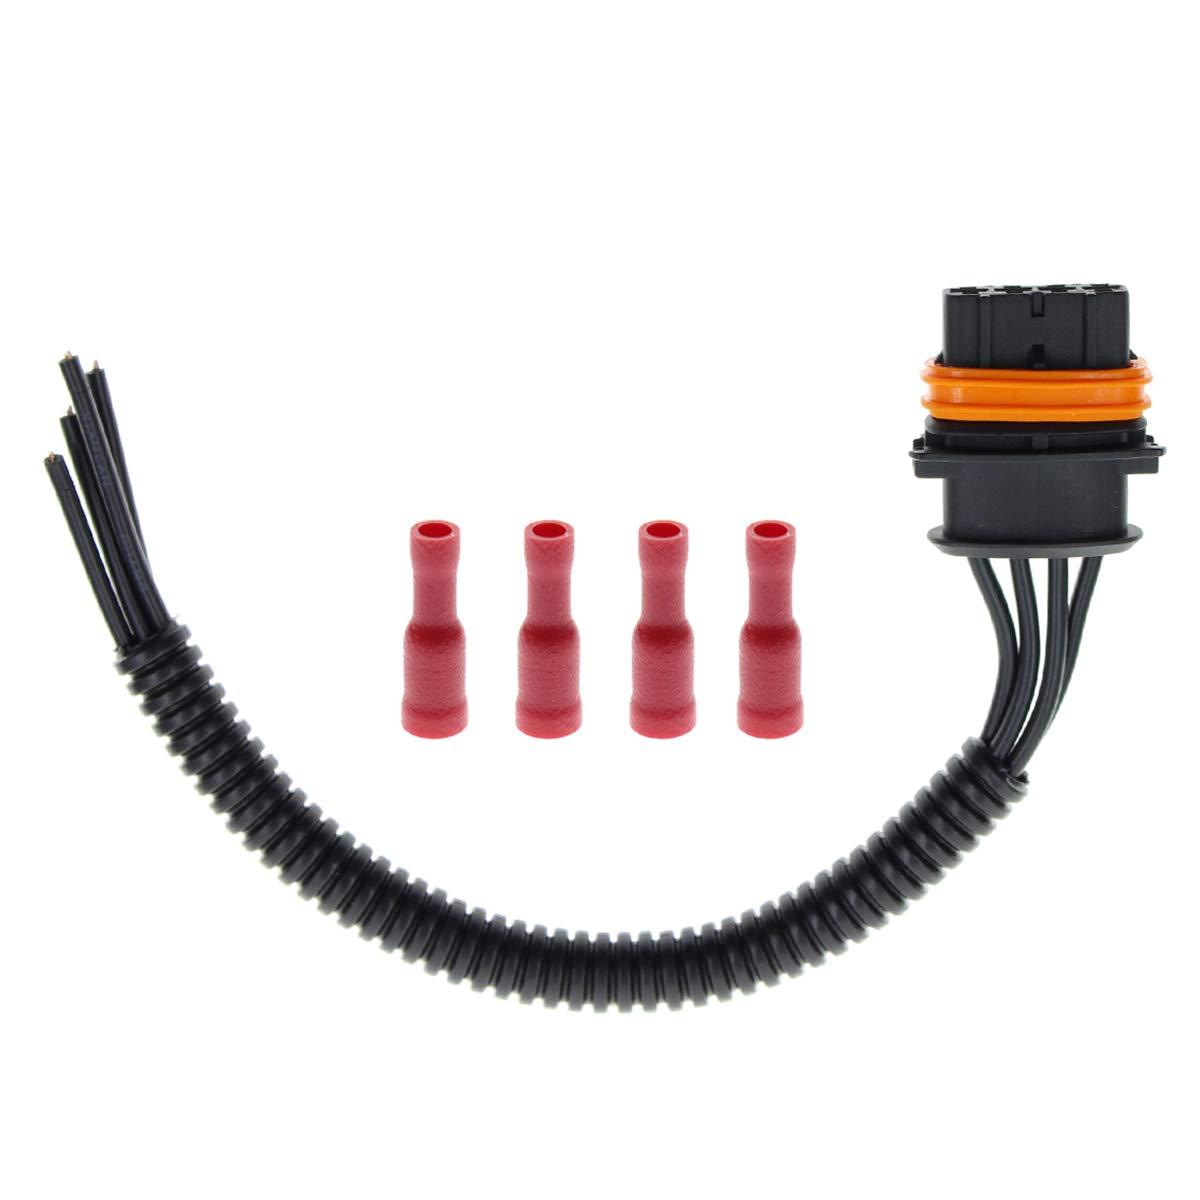 AUTOKAY New T-Bap Sensor Wiring Repair Harness ATV for Polaris Ranger 570 800 900 XP RZR